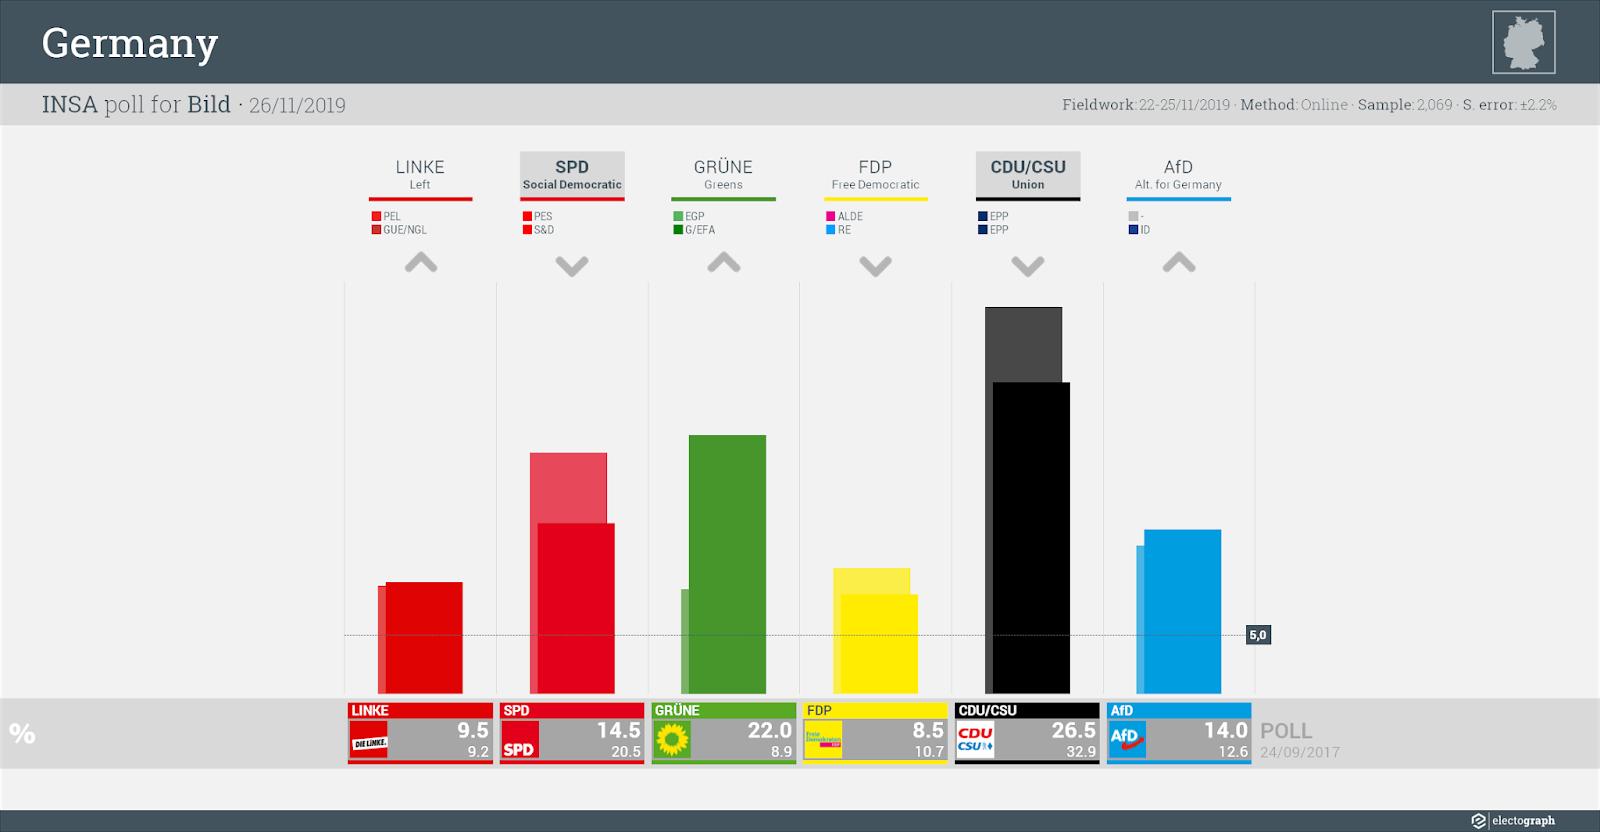 GERMANY: INSA poll chart for Bild, 26 November 2019